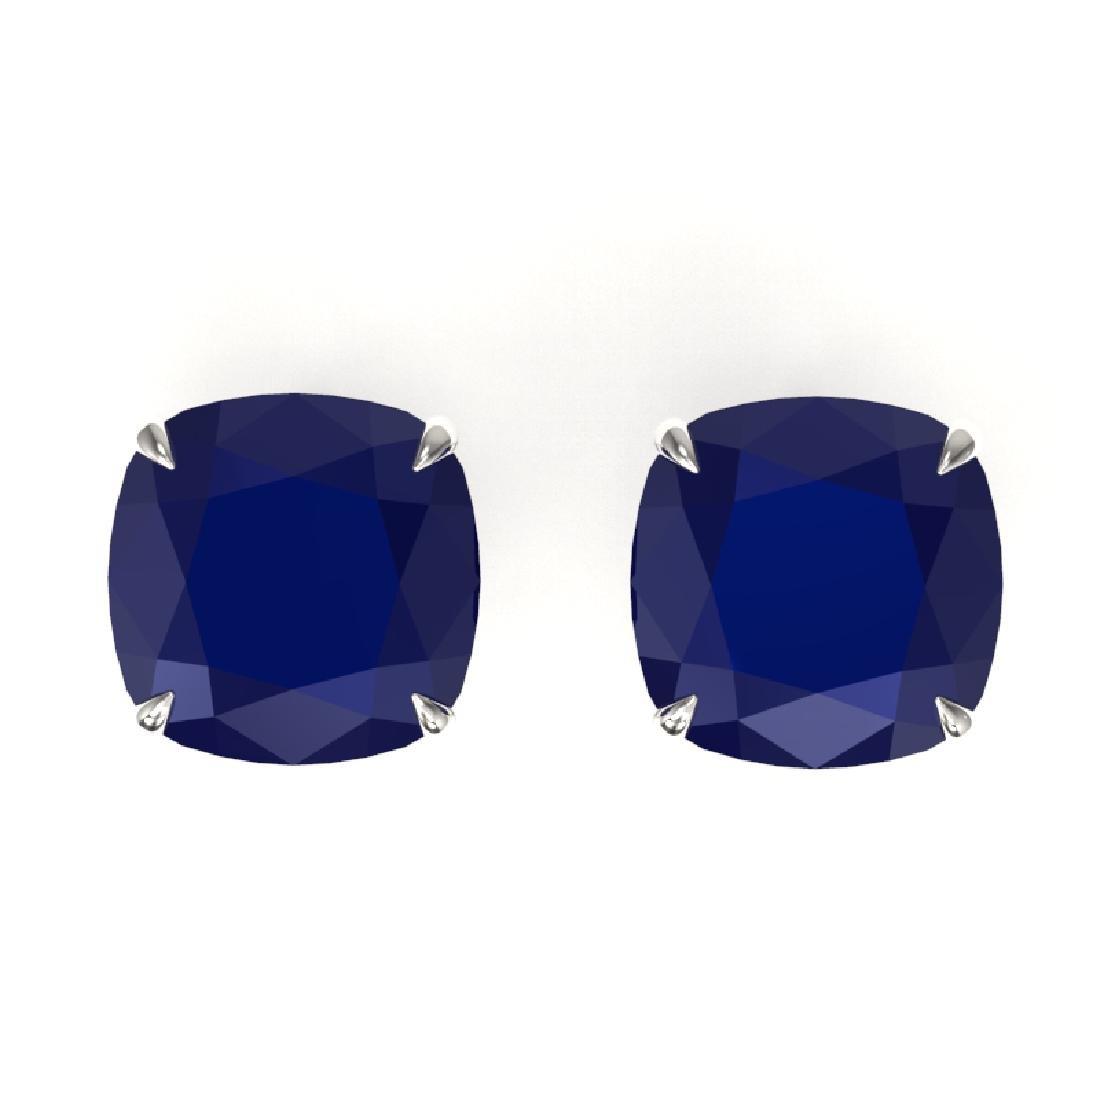 12 CTW Cushion Cut Sapphire Designer Inspired Stud